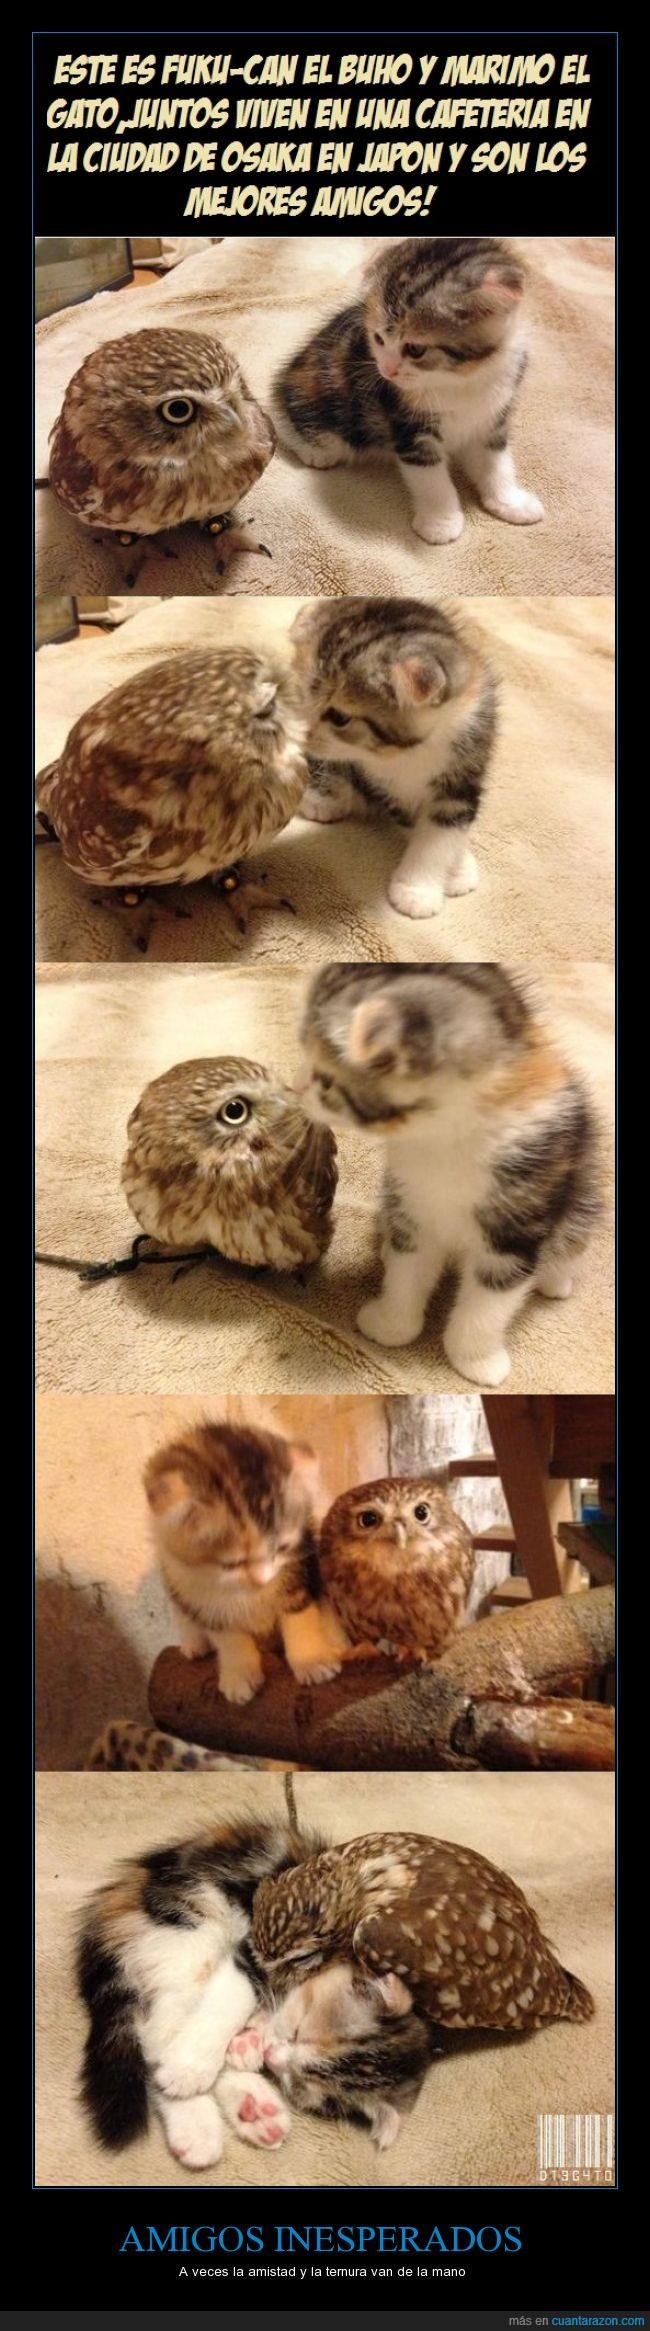 amistad,animales,buho,fuku-can,gato,marimo